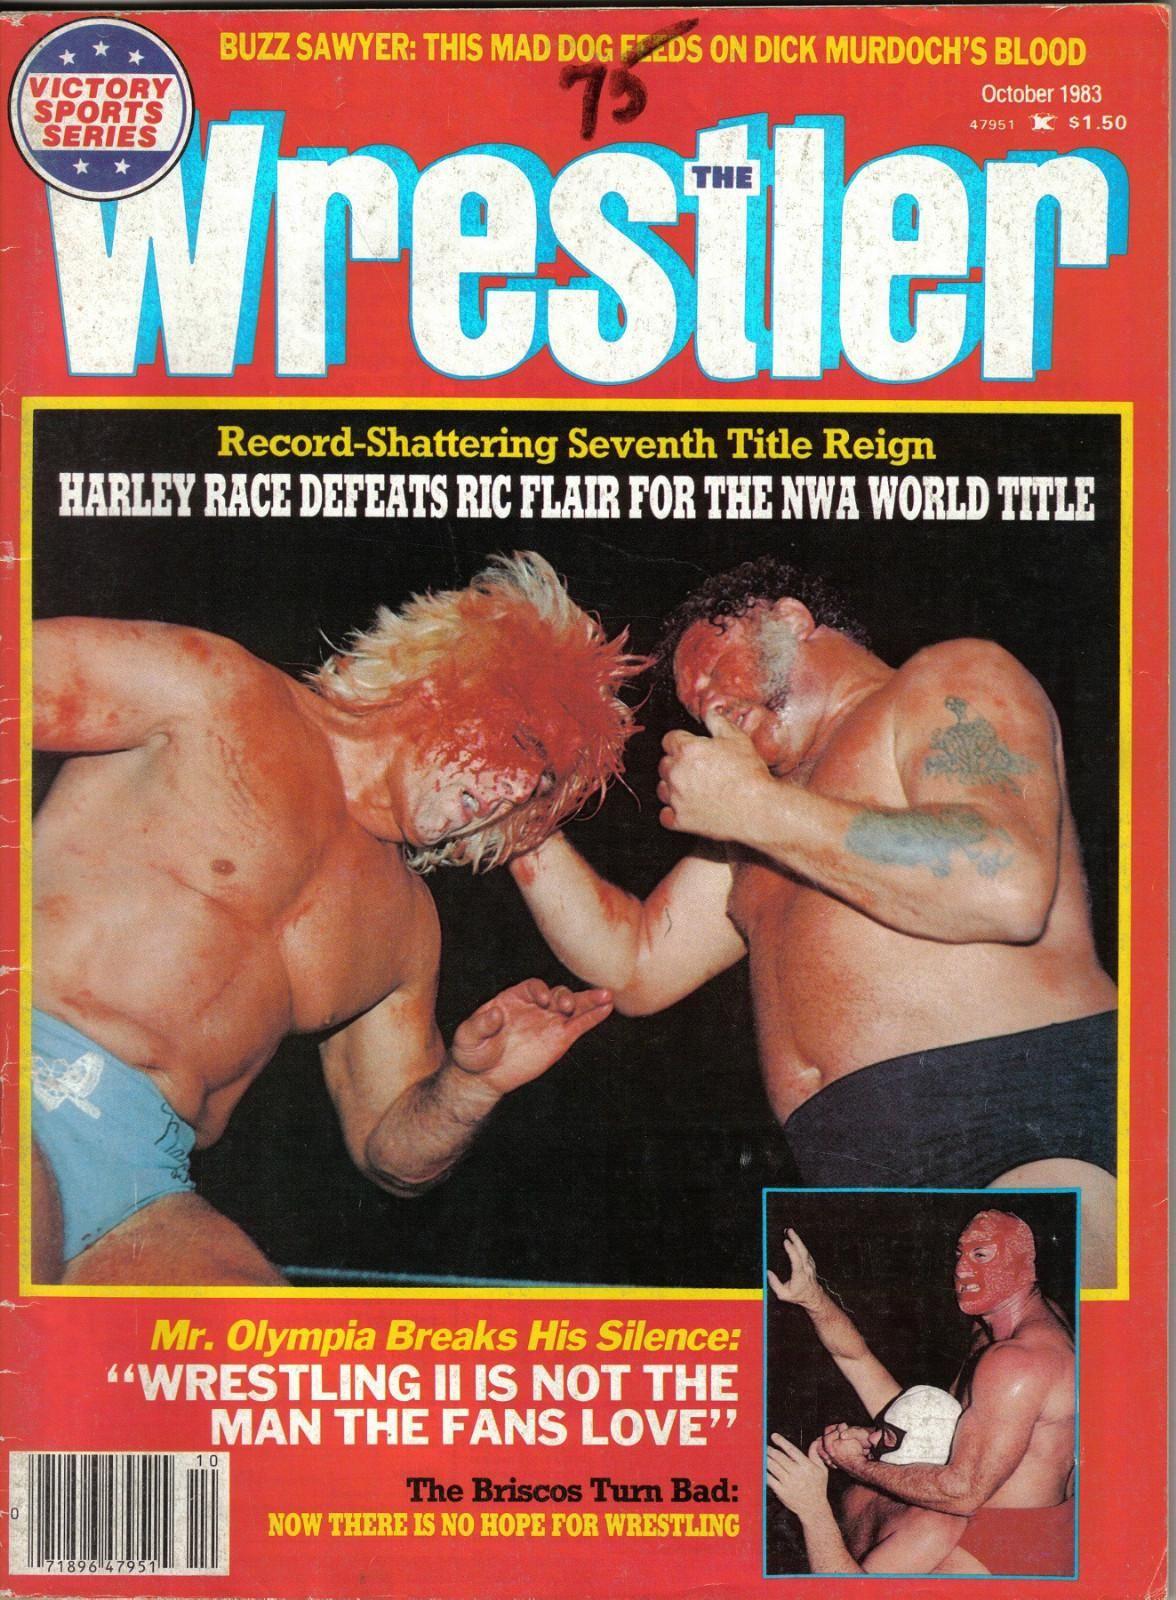 Harley Race wins NWA title Wrestler Cover.jpg